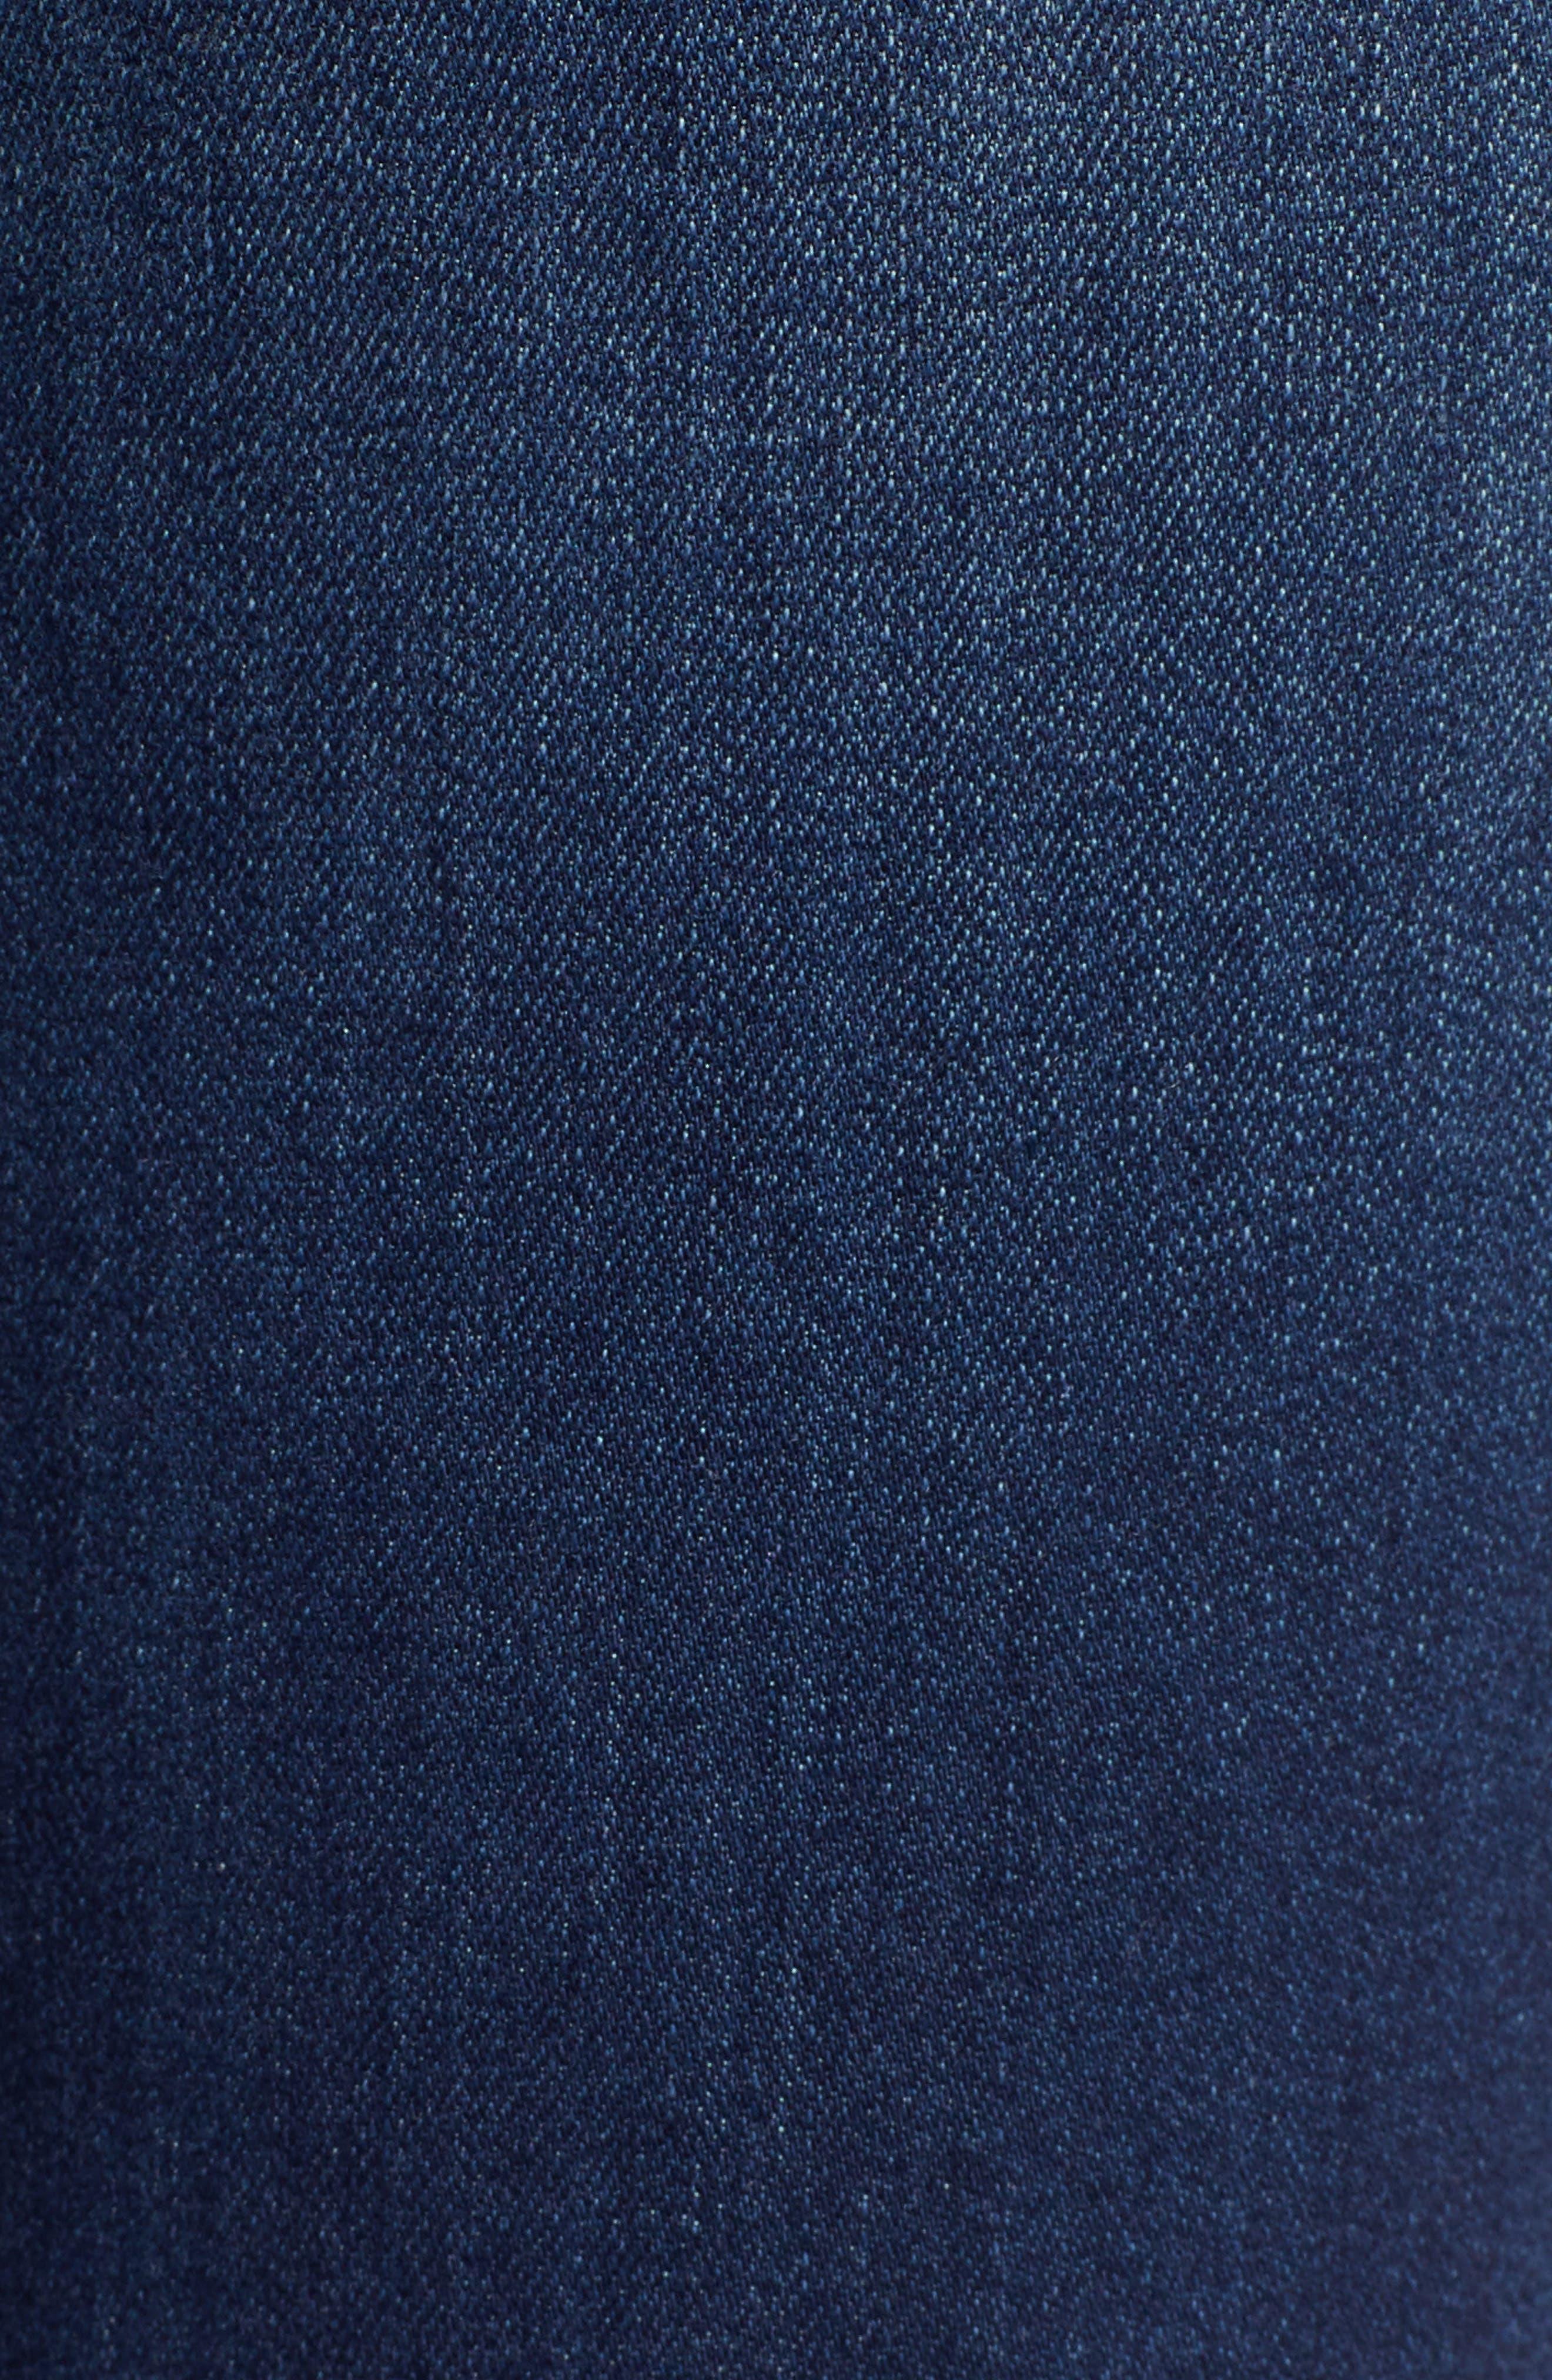 Ab-solution Luxe Touch Premium Jeans,                             Alternate thumbnail 6, color,                             420